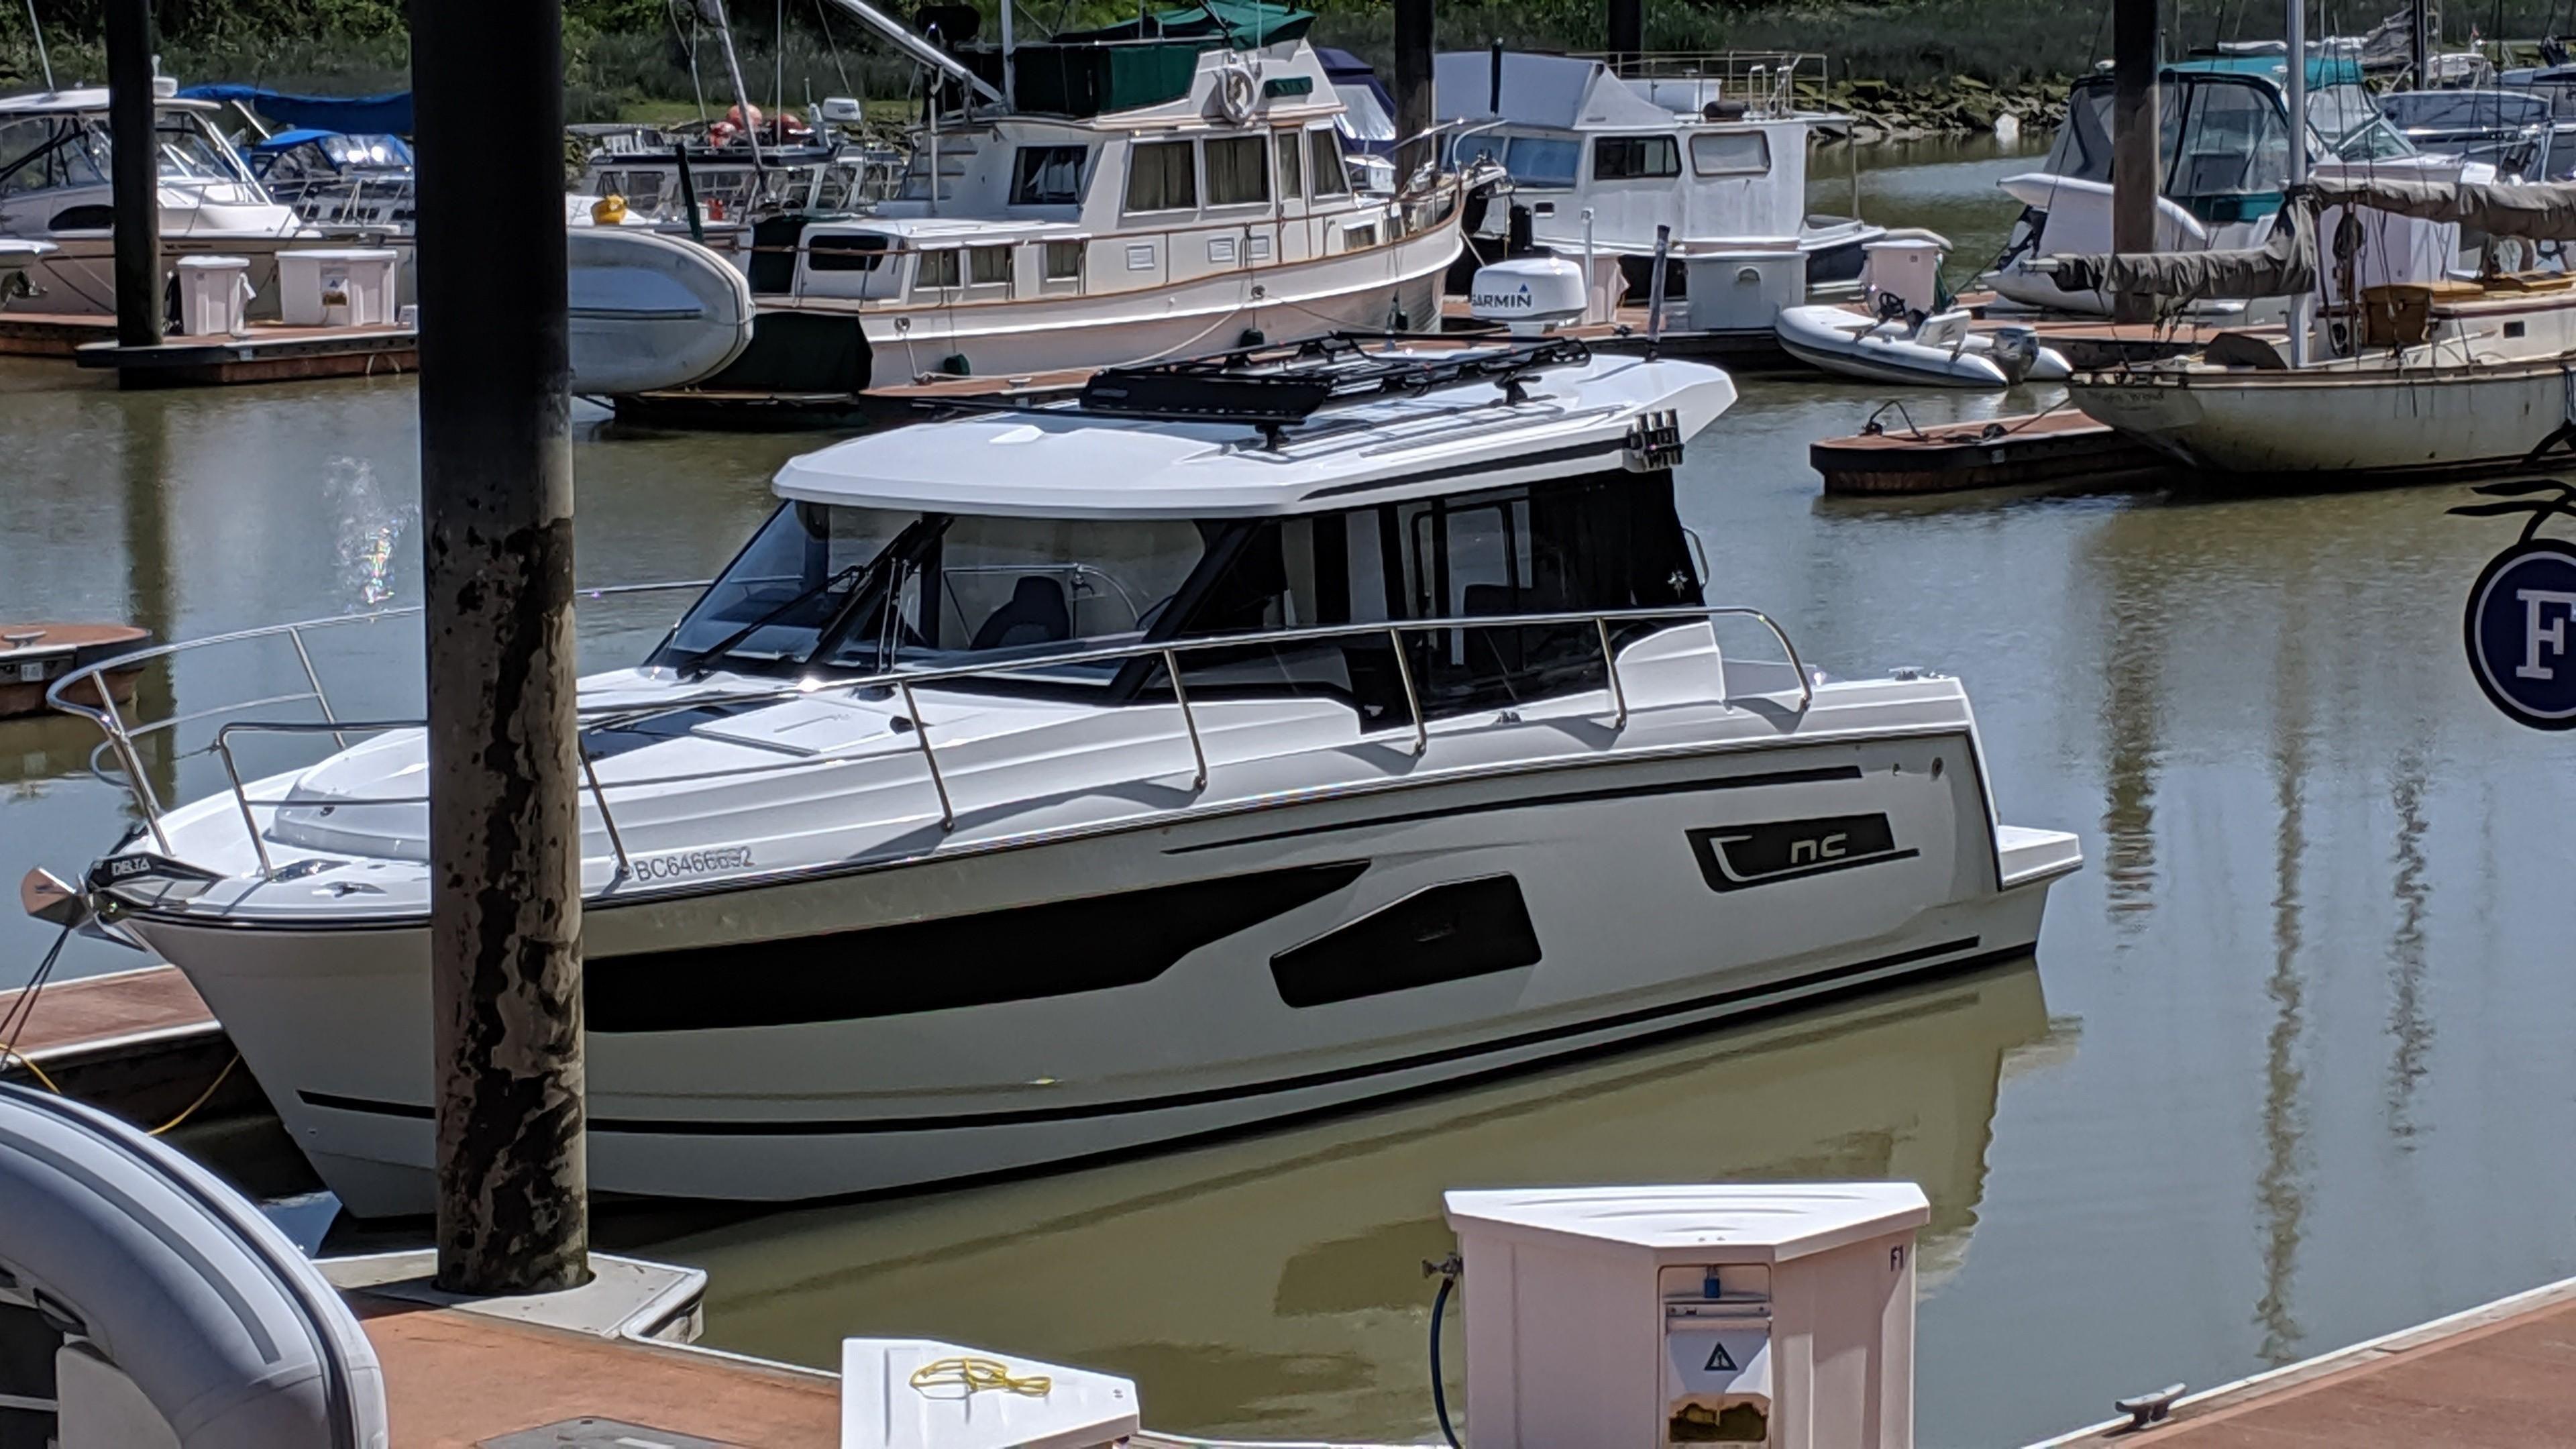 2019 Jeanneau Nc 1095 Power Boat For Sale Www Yachtworld Com